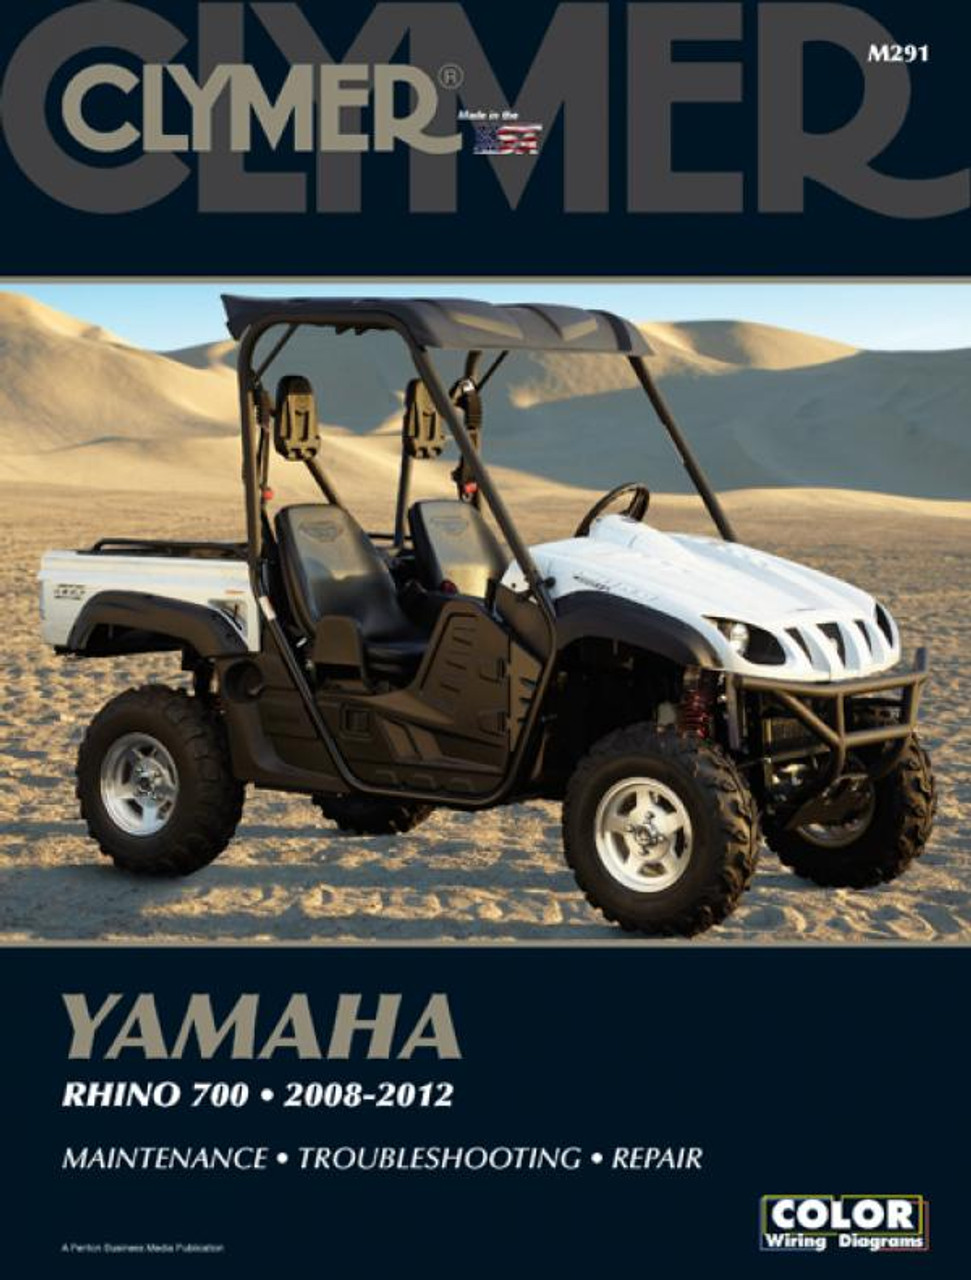 yamaha rhino 700 atvs 2008 2012 clymer workshop manual yamaha rhino 700 vacuum diagram [ 971 x 1280 Pixel ]